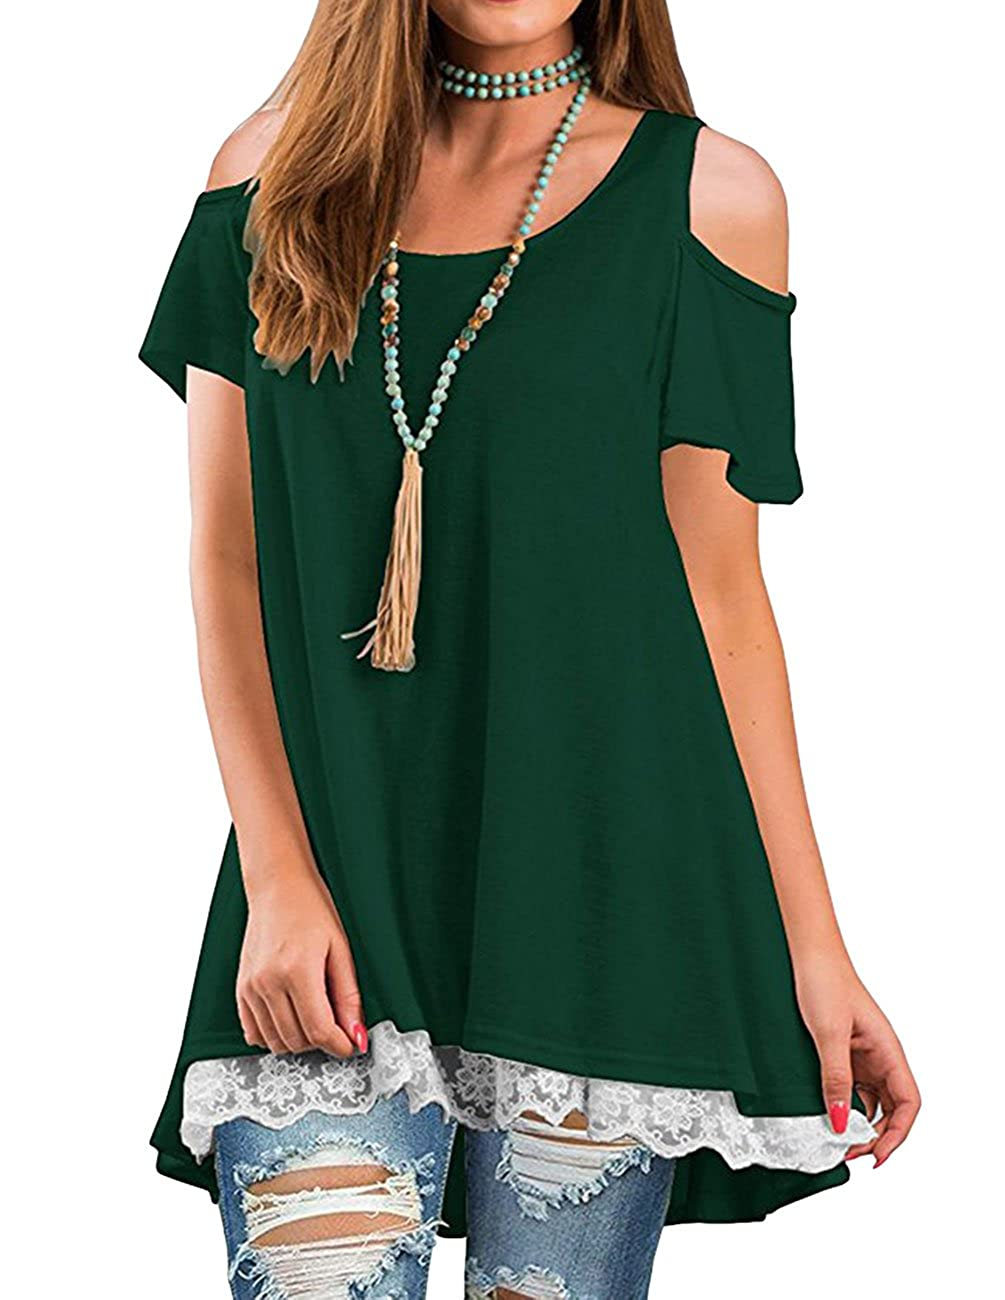 Dark Green3 Jiu1ai Womens Loose Fit Casual Shirts Short Sleeve Flowy Tunic Top Leggings